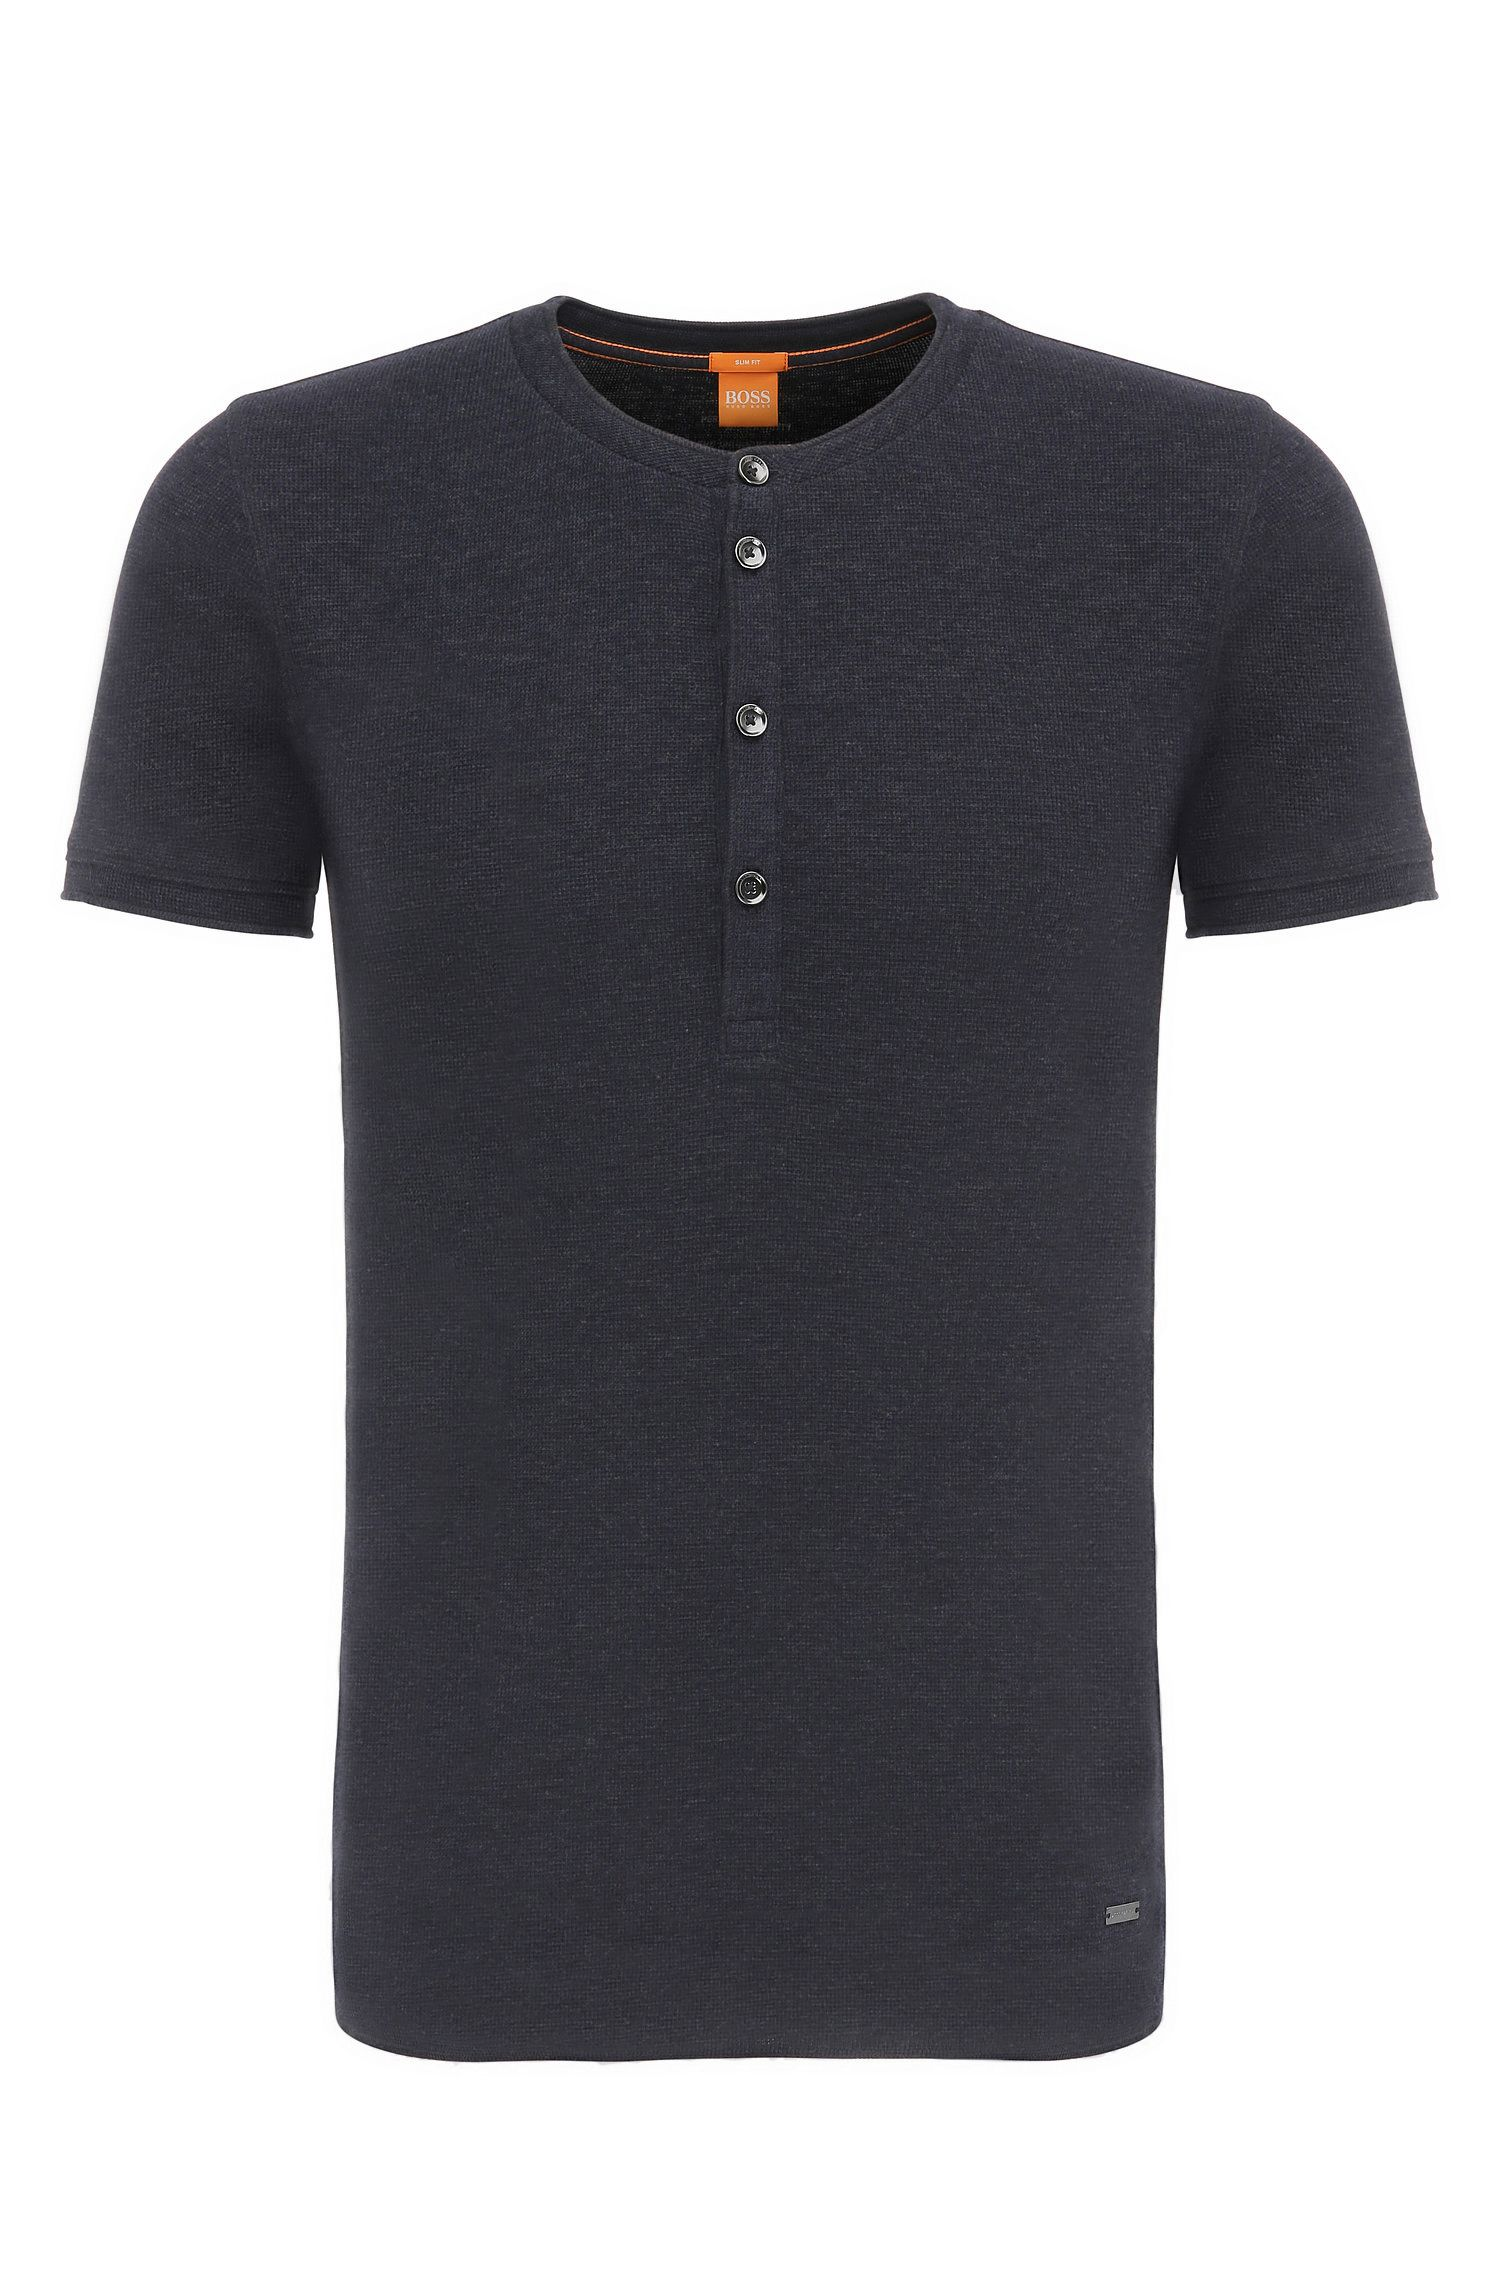 Camiseta Henley slim fit en algodón: 'Topside'